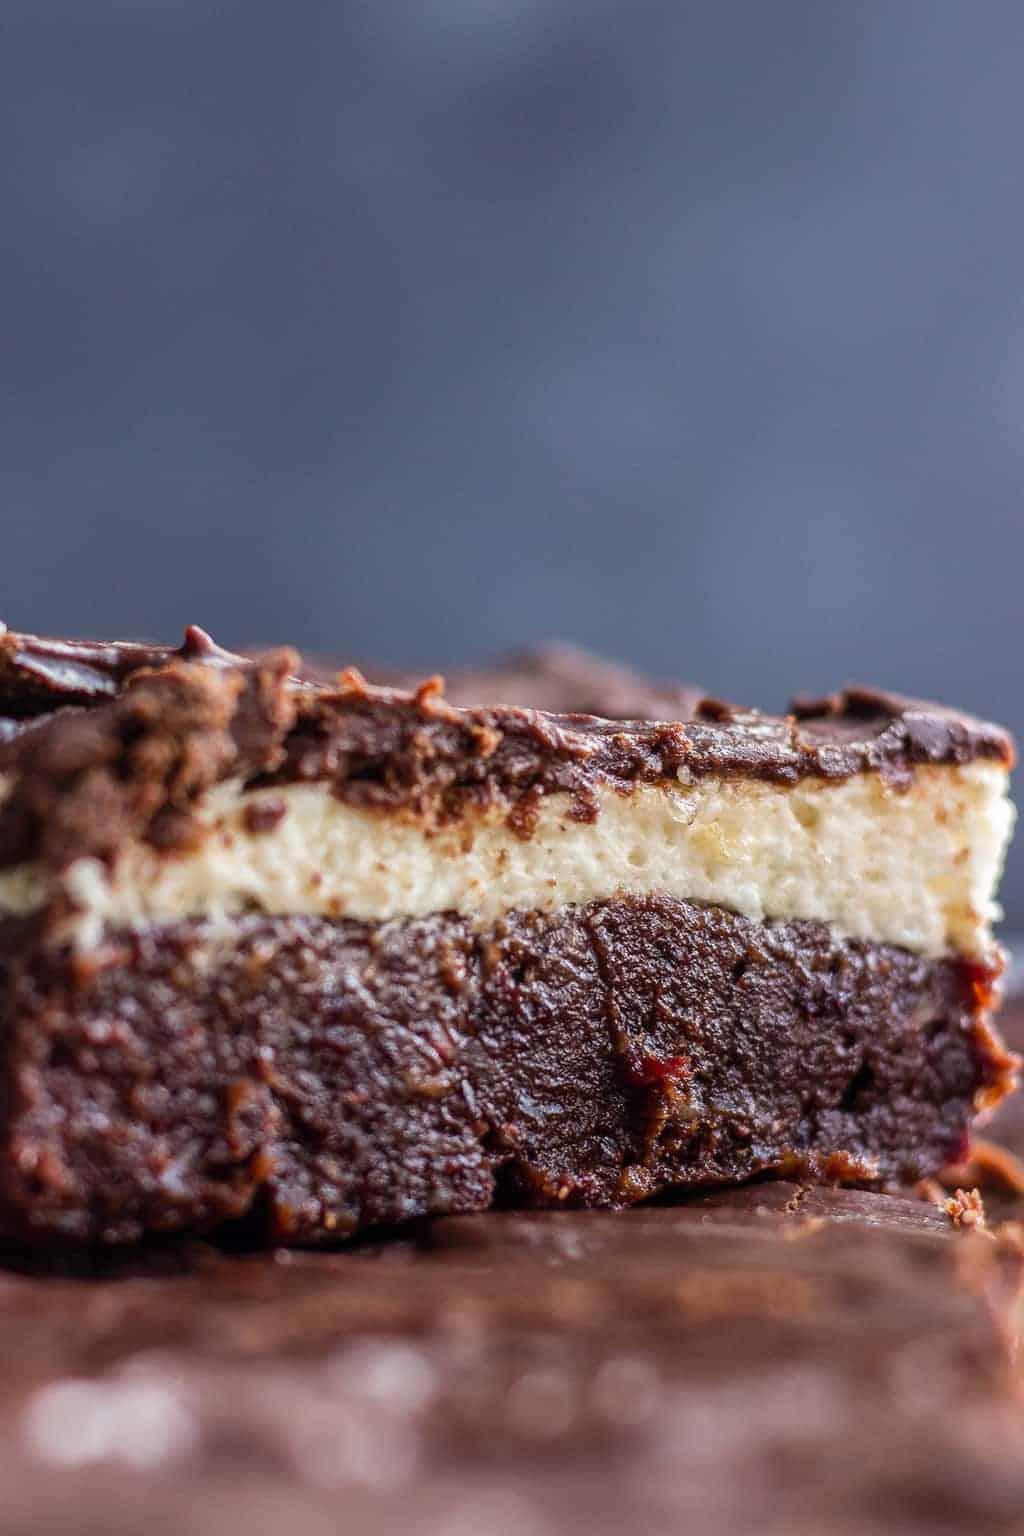 Cut up slice of no bake brownies